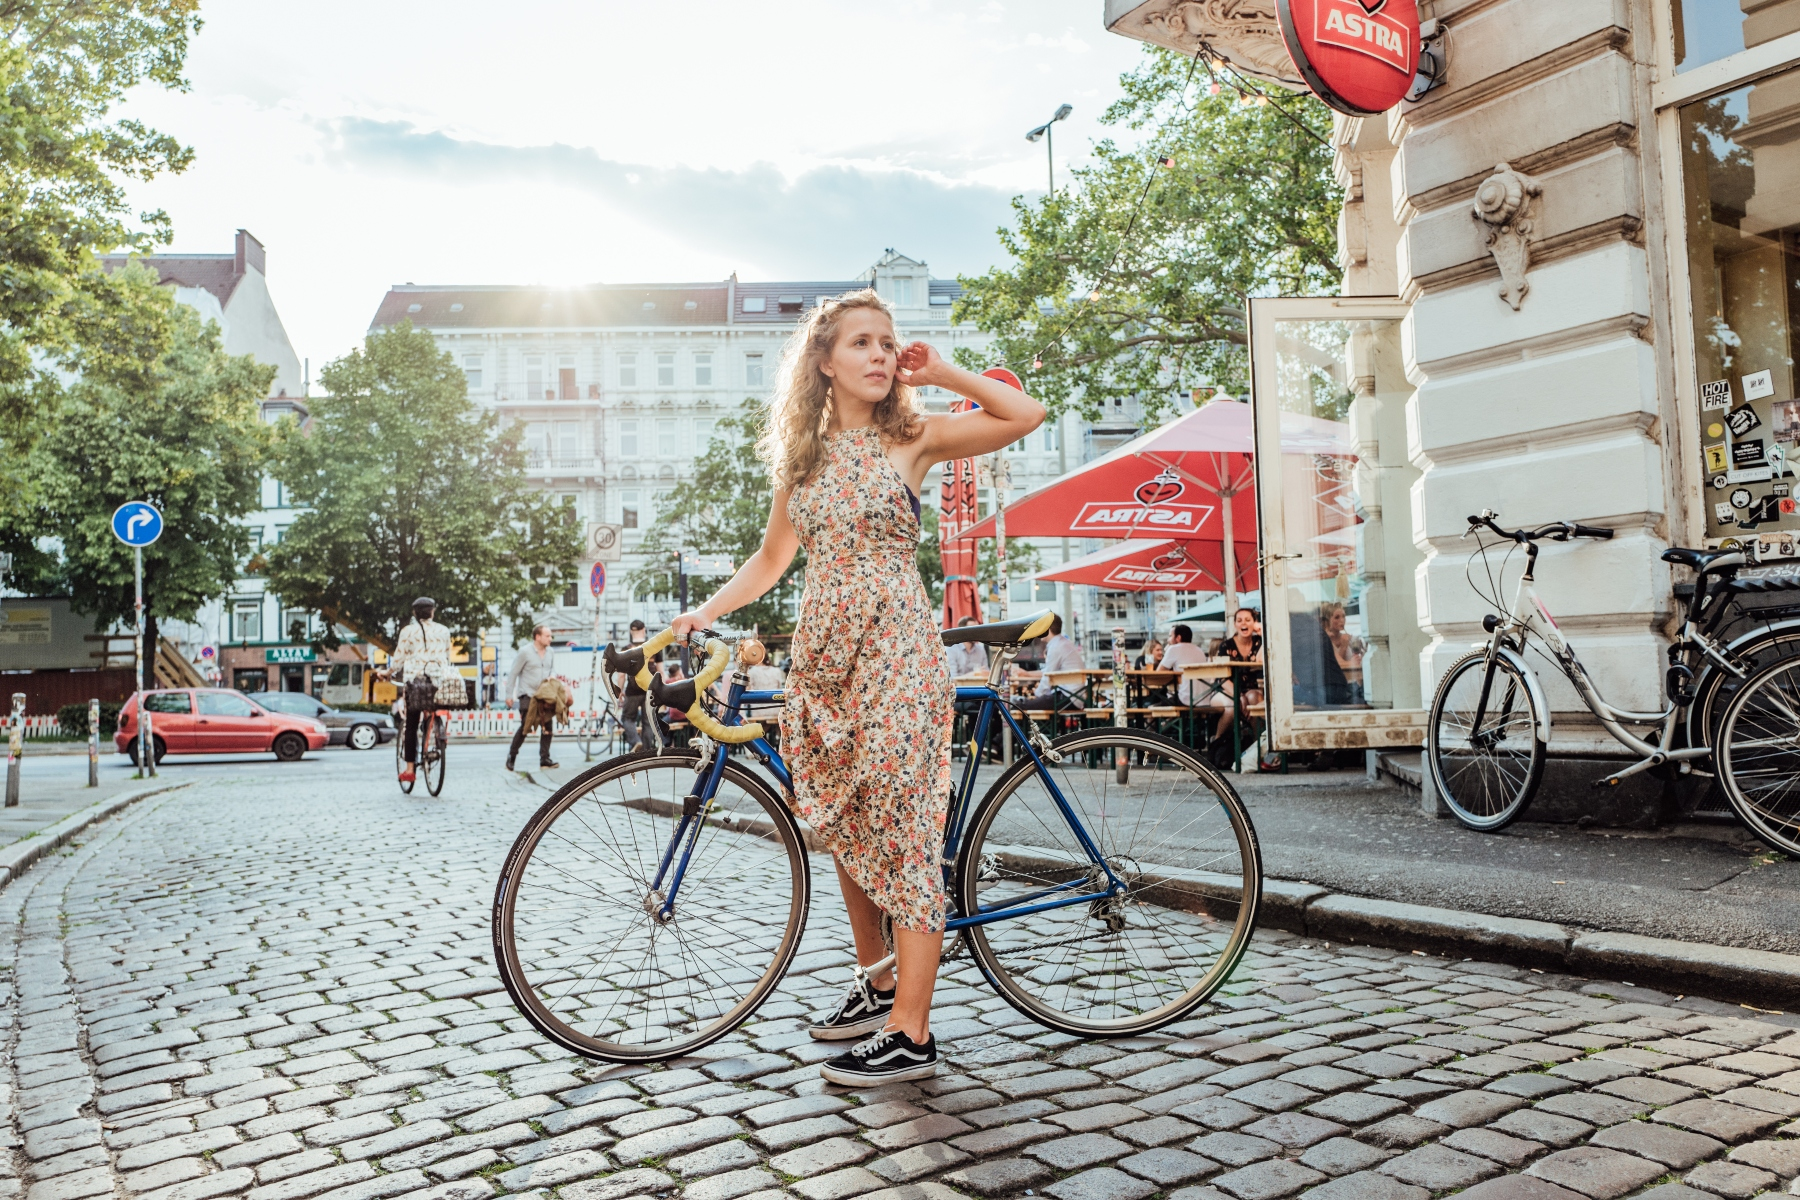 Geheimtipp Hamburg Radporterin Folge 1 Lisa Knauer 4